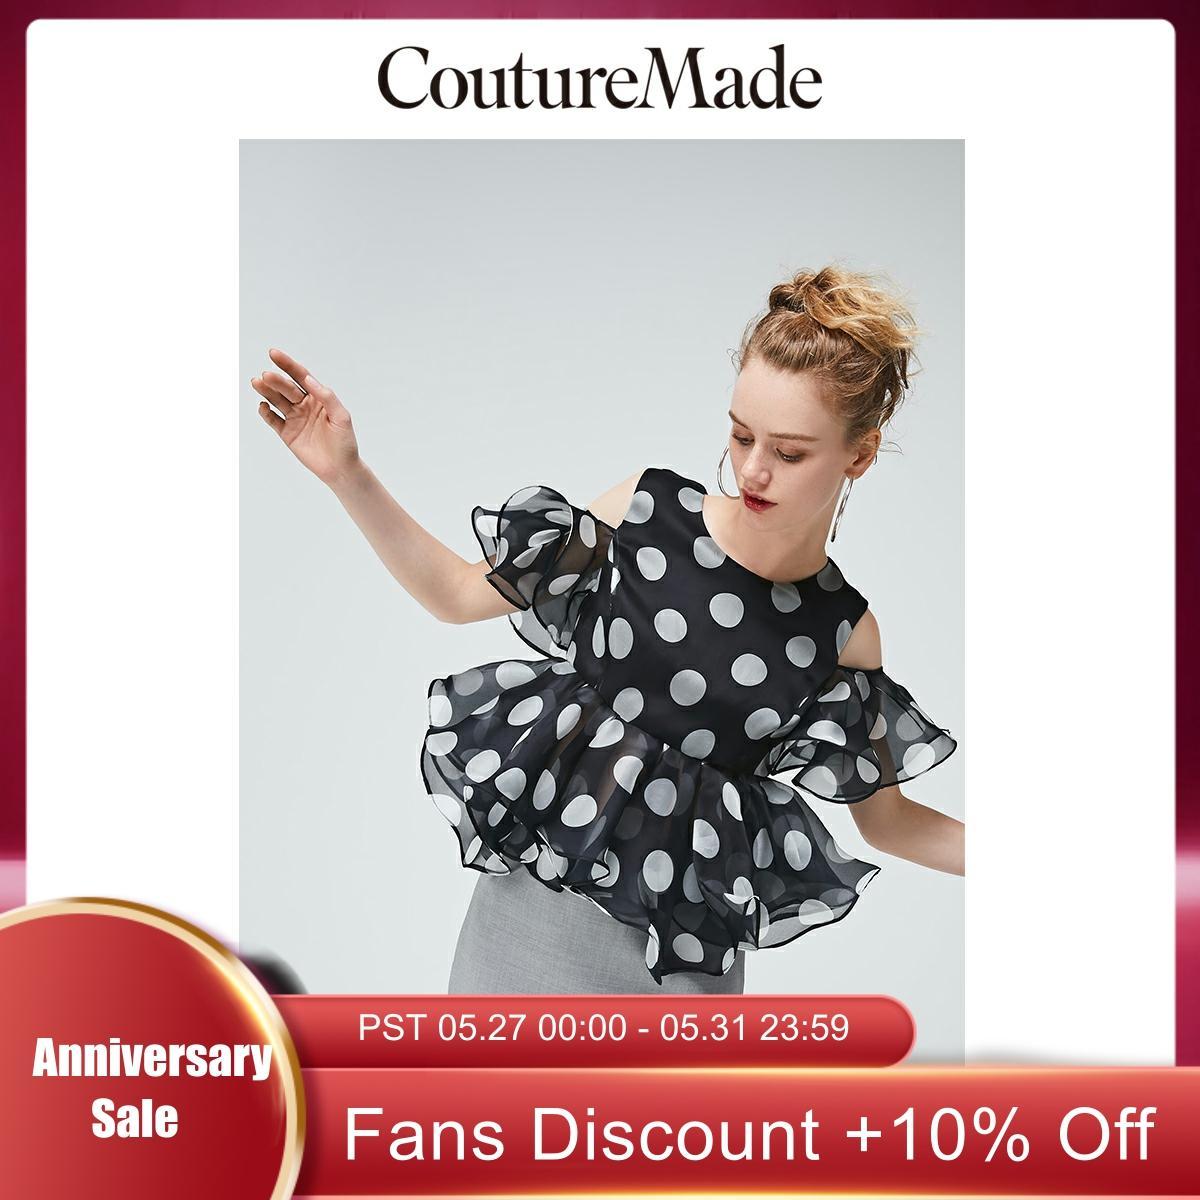 Vero Moda CoutureMade Women's Off-the-shoulder Ruffled Mulberry Silk Chiffon Top Blouse | 31926X530